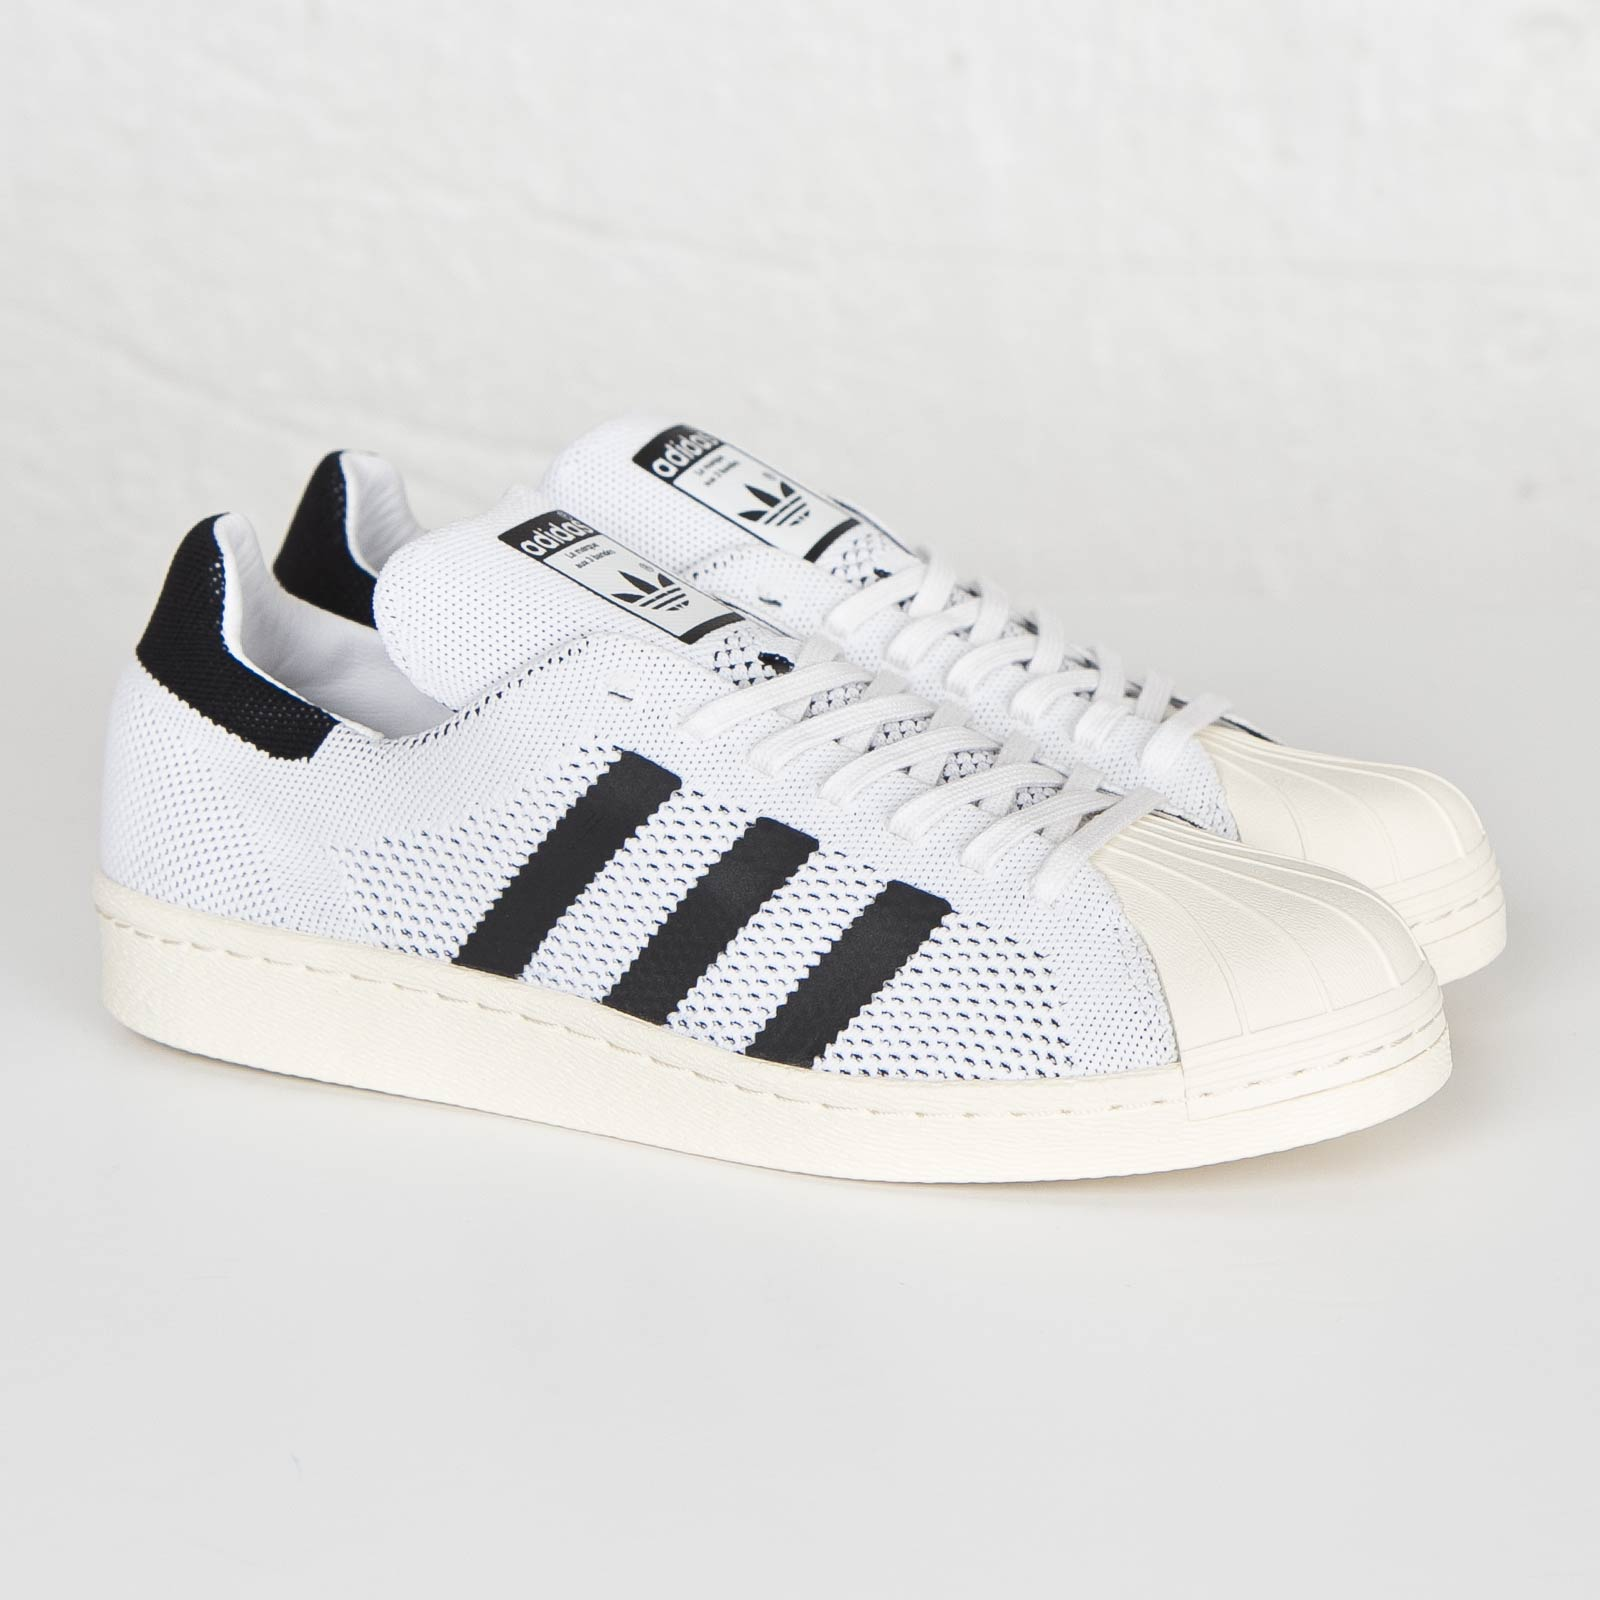 091765f5a7d adidas Superstar 80s Primeknit - S82779 - Sneakersnstuff